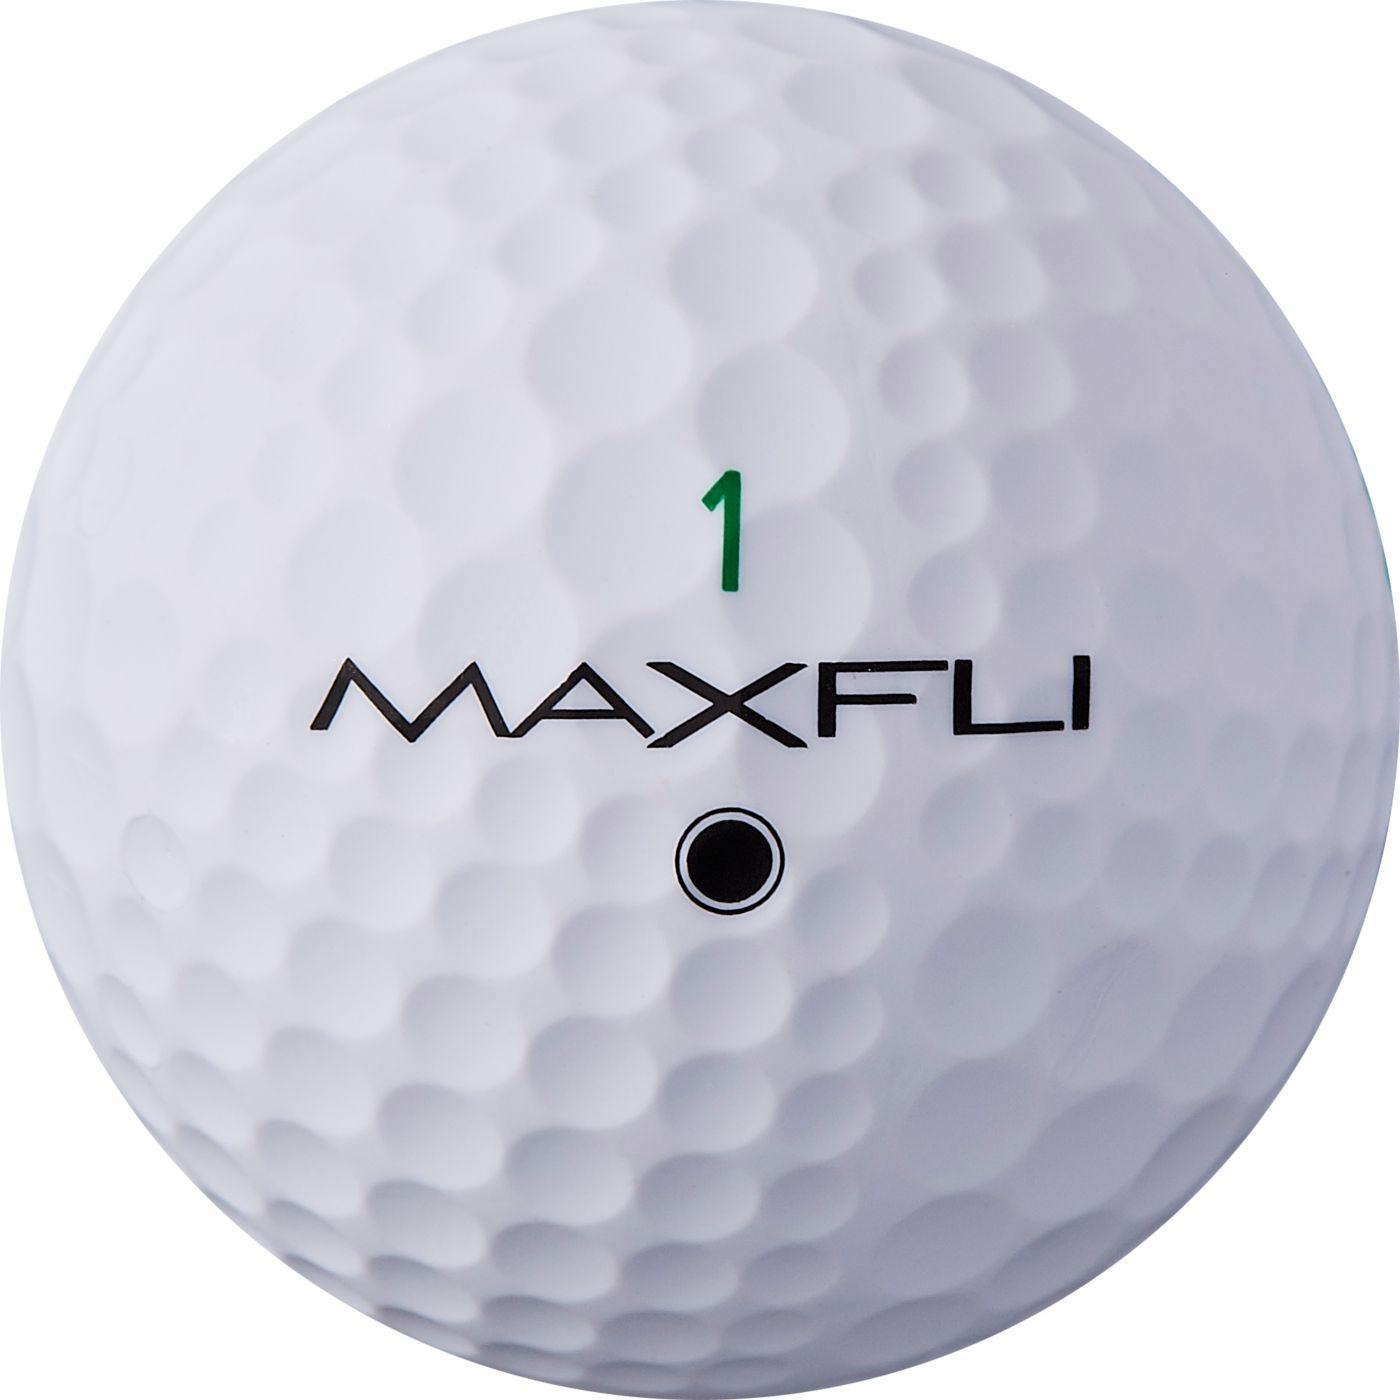 Maxfli StraightFli Matte White Personalized Golf Balls